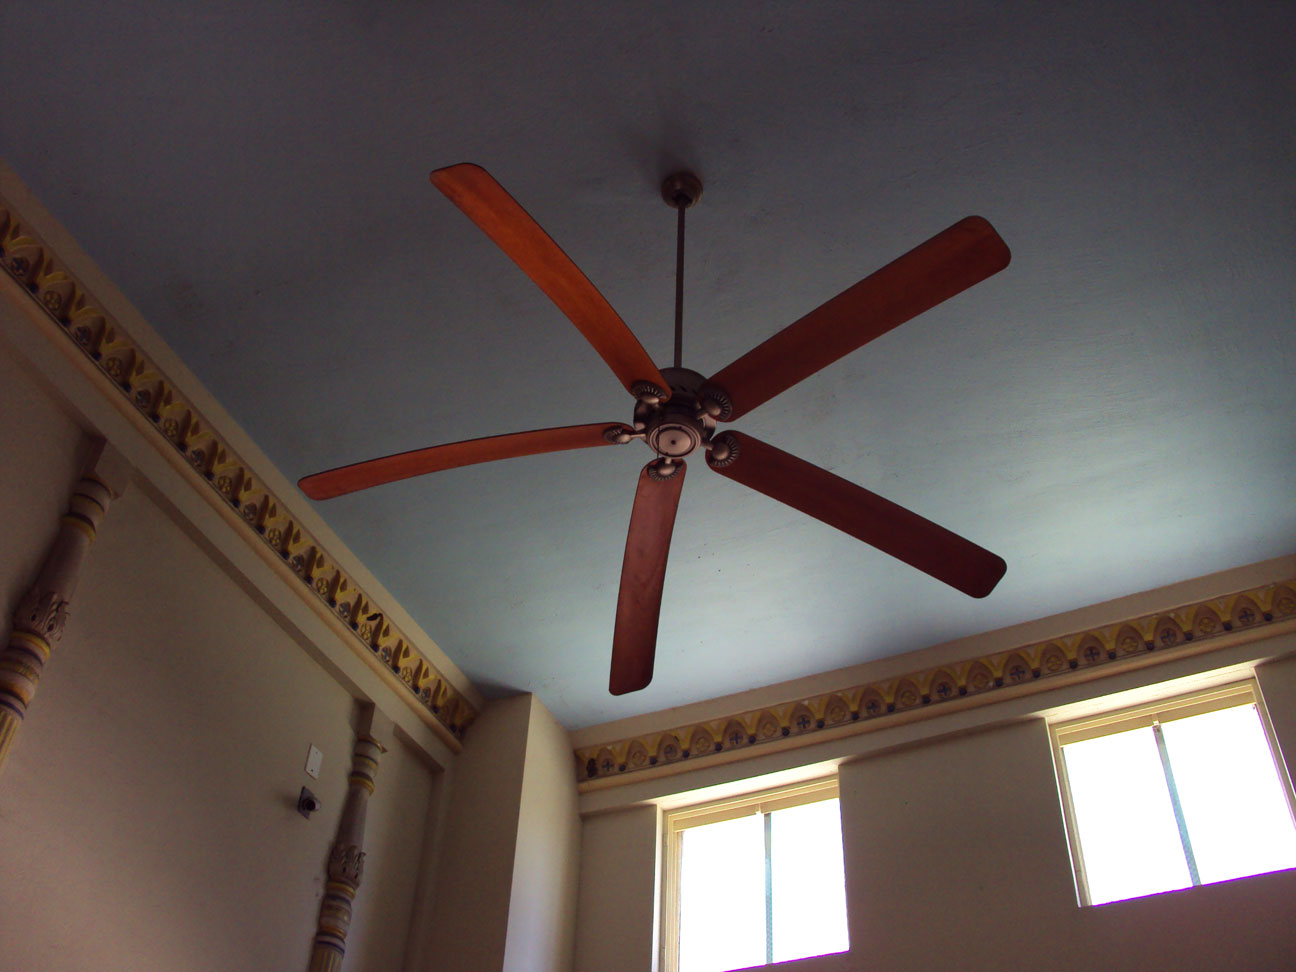 Vintage Ceiling Fan Viewing Gallery